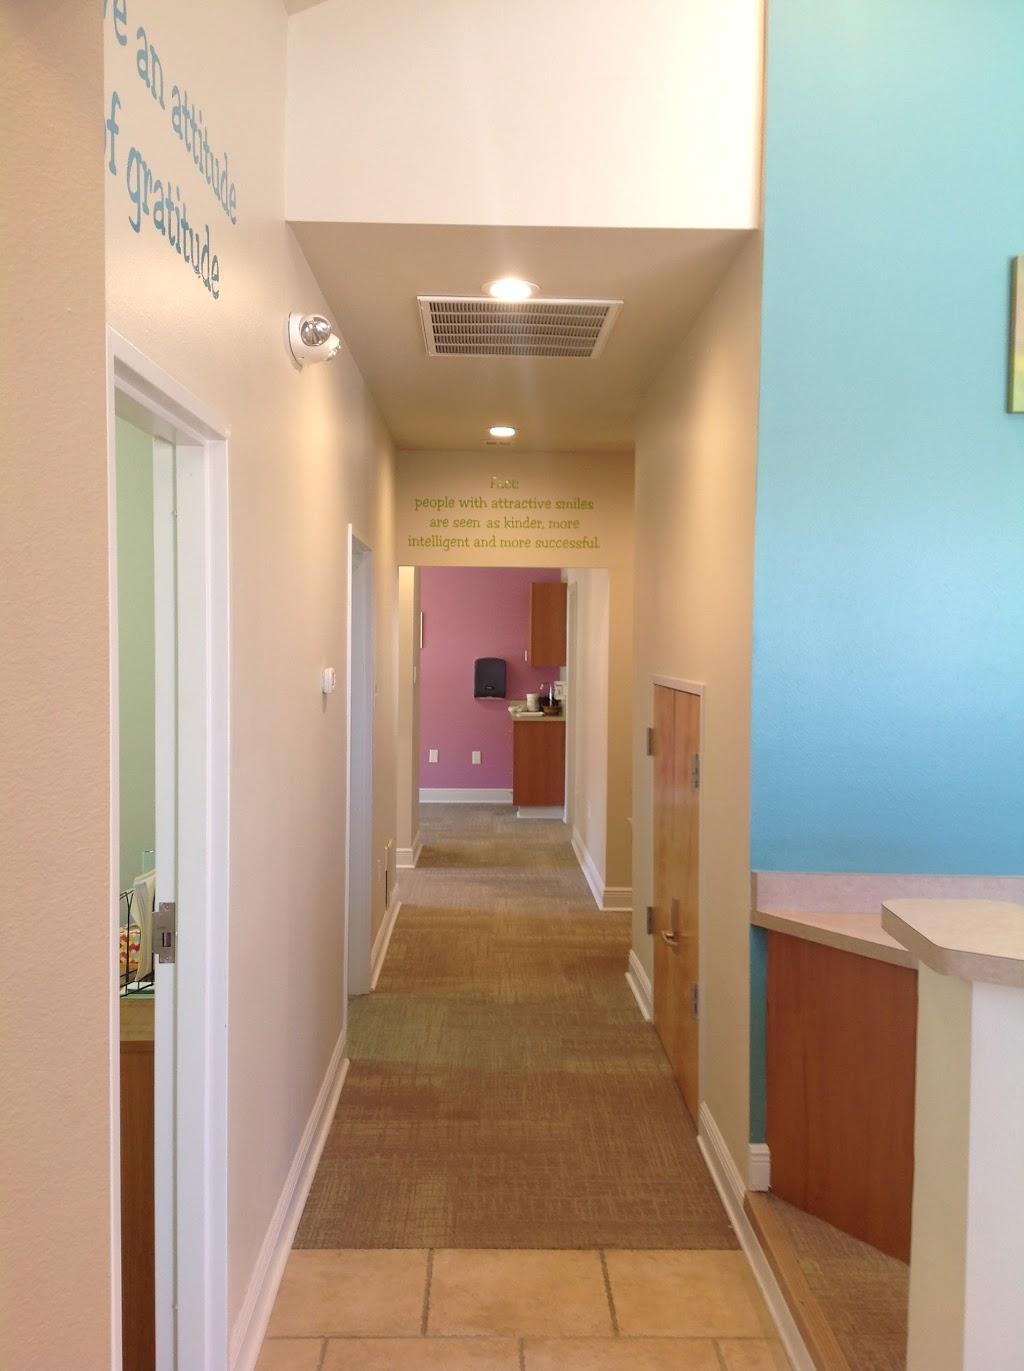 Hamada Orthodontics - dentist  | Photo 4 of 6 | Address: 131 Ormond Center Ct, Destrehan, LA 70047, USA | Phone: (985) 725-0509